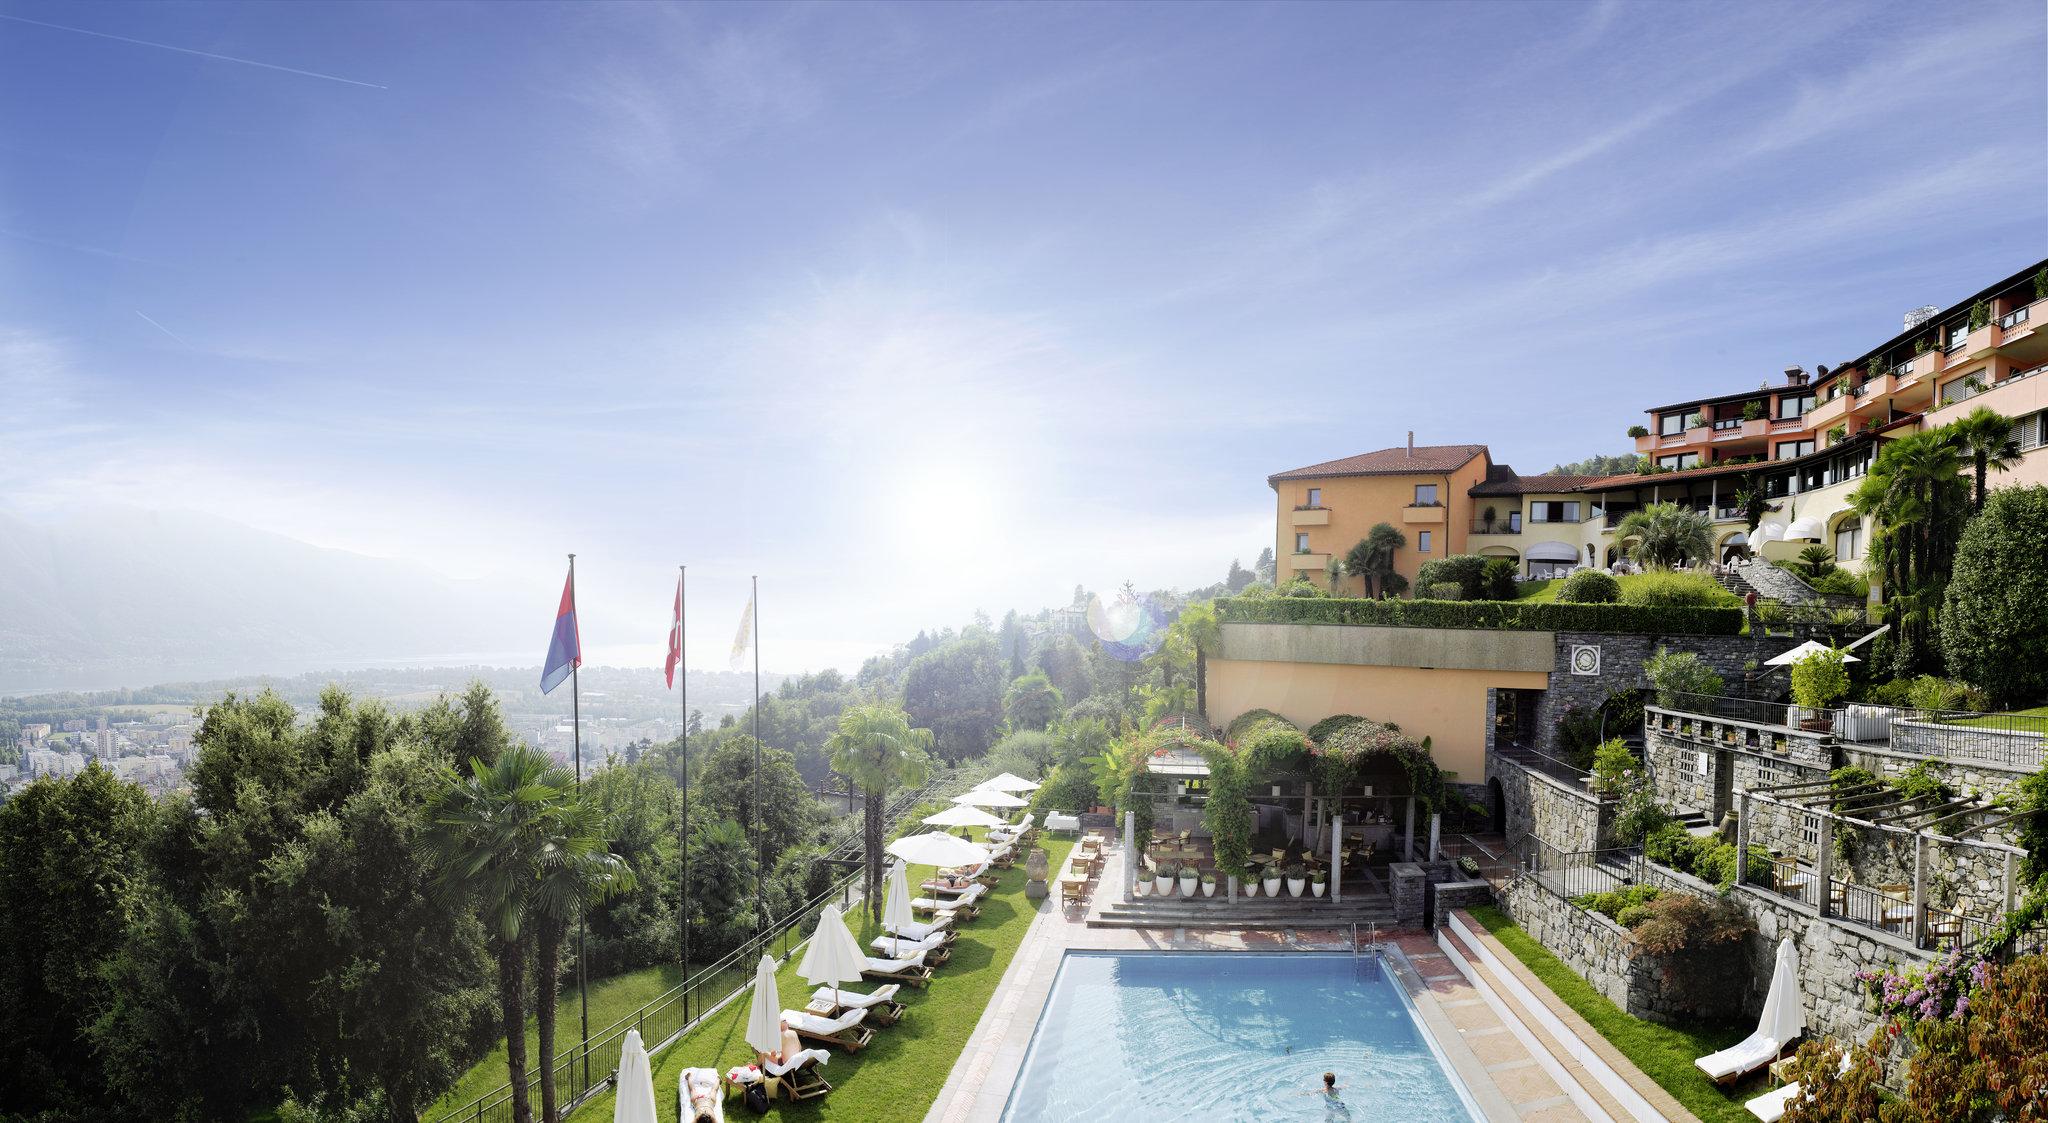 Villa Orselina Hotel